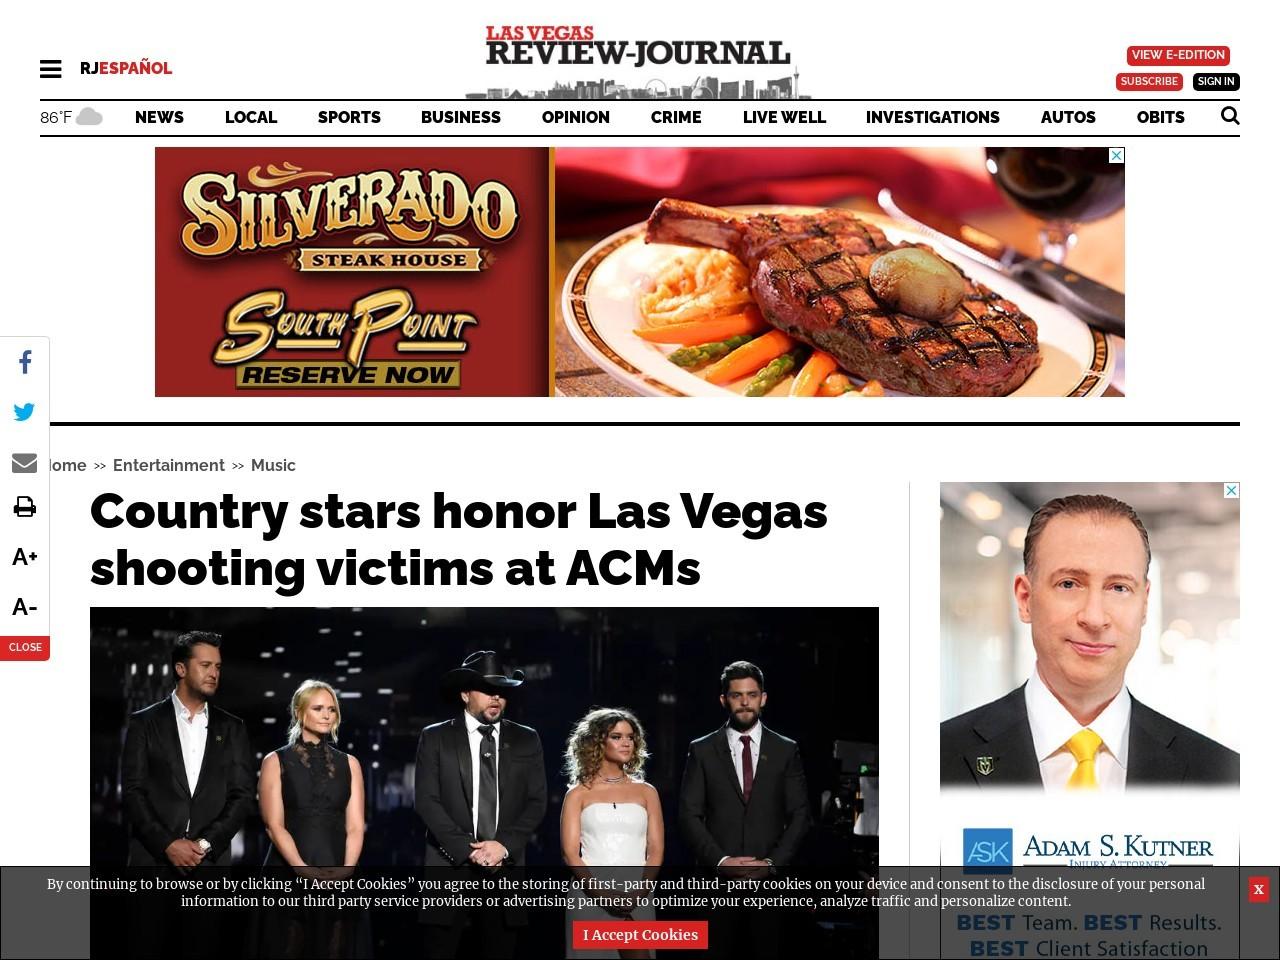 Country stars honor Las Vegas shooting victims at ACMs